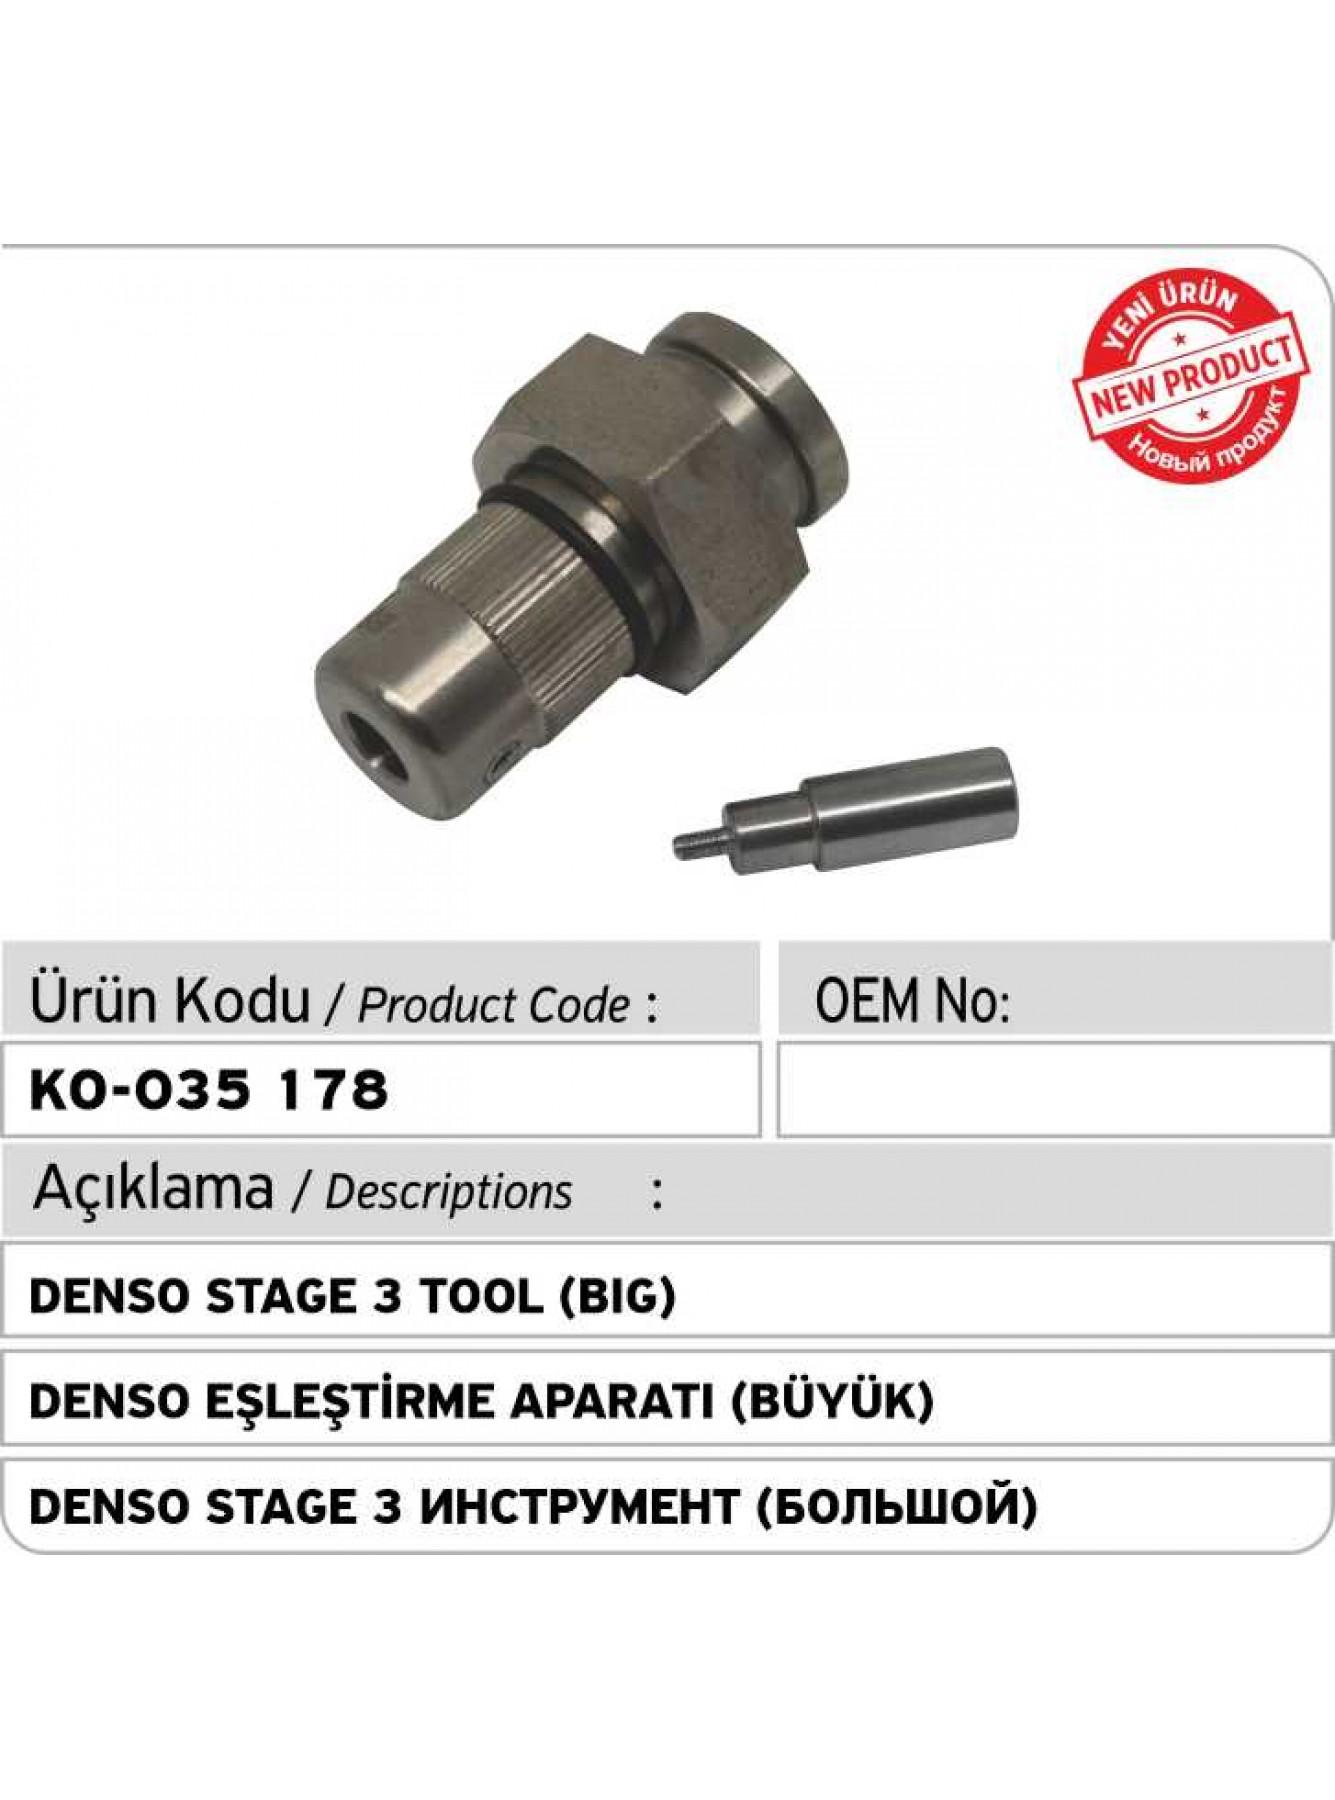 Denso Stage 3 Инструмент (Большой)